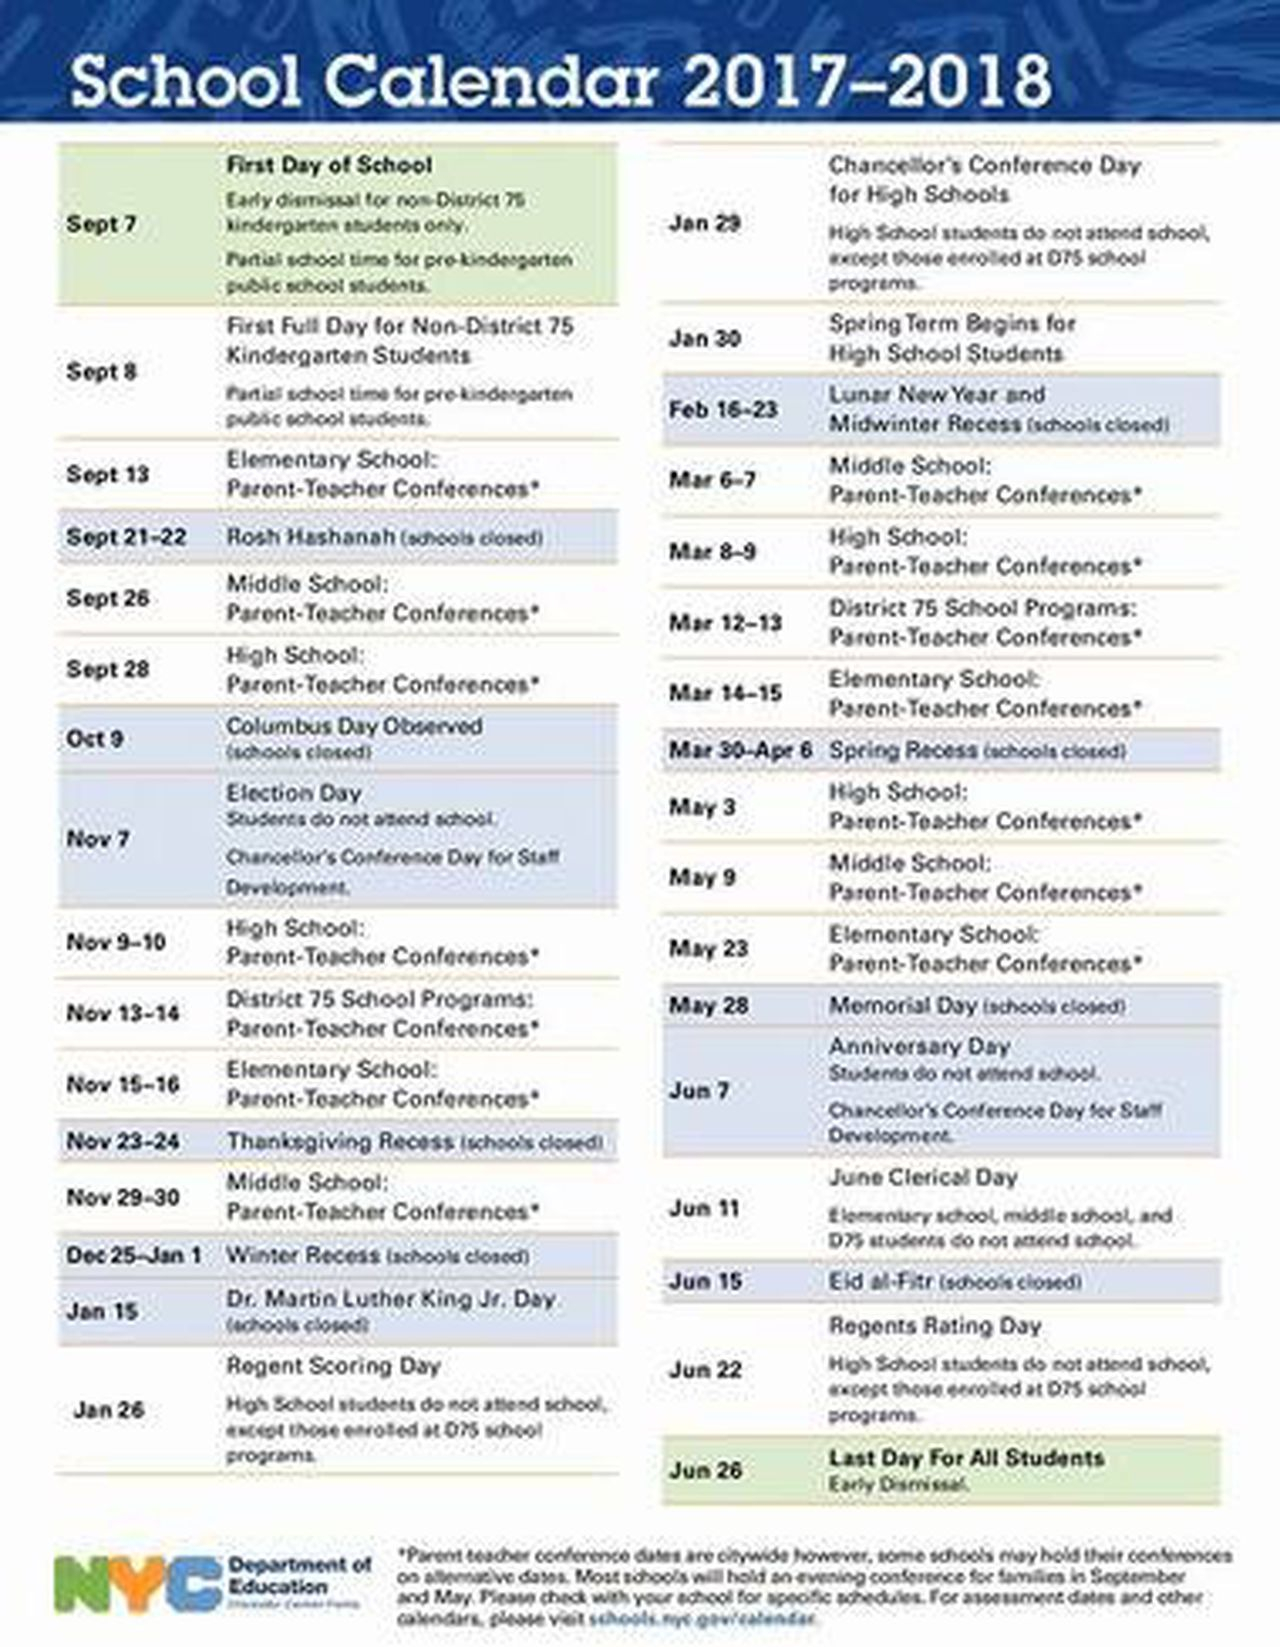 First Look: Nyc Public School Calendar For 2017 2018 In Staten Island College Callendar